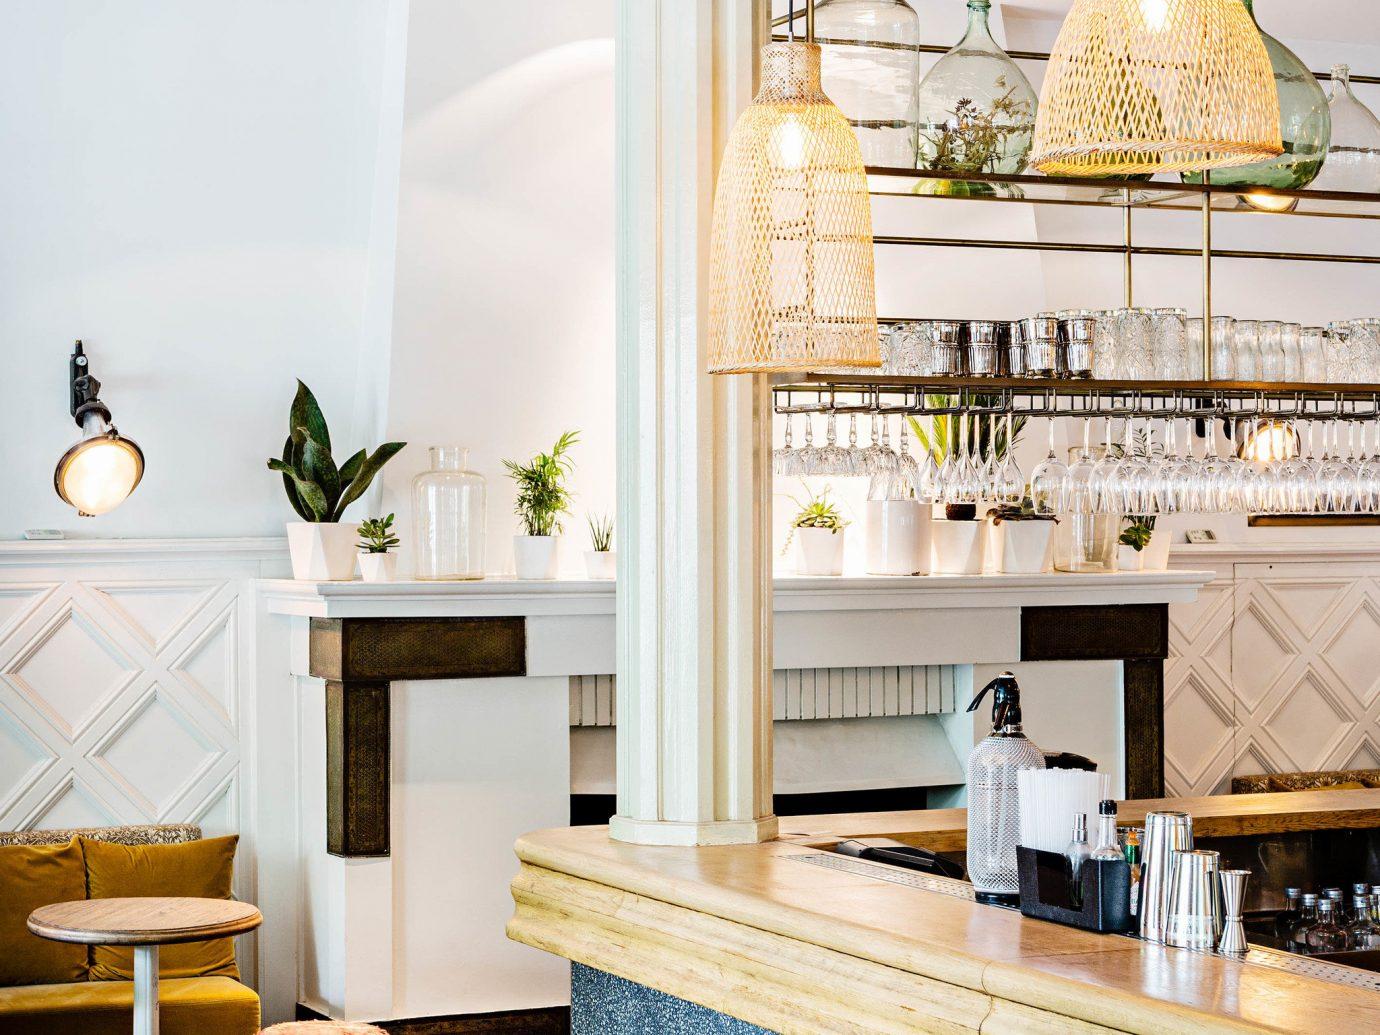 Food + Drink Paris Trip Ideas indoor interior design table home furniture living room ceiling